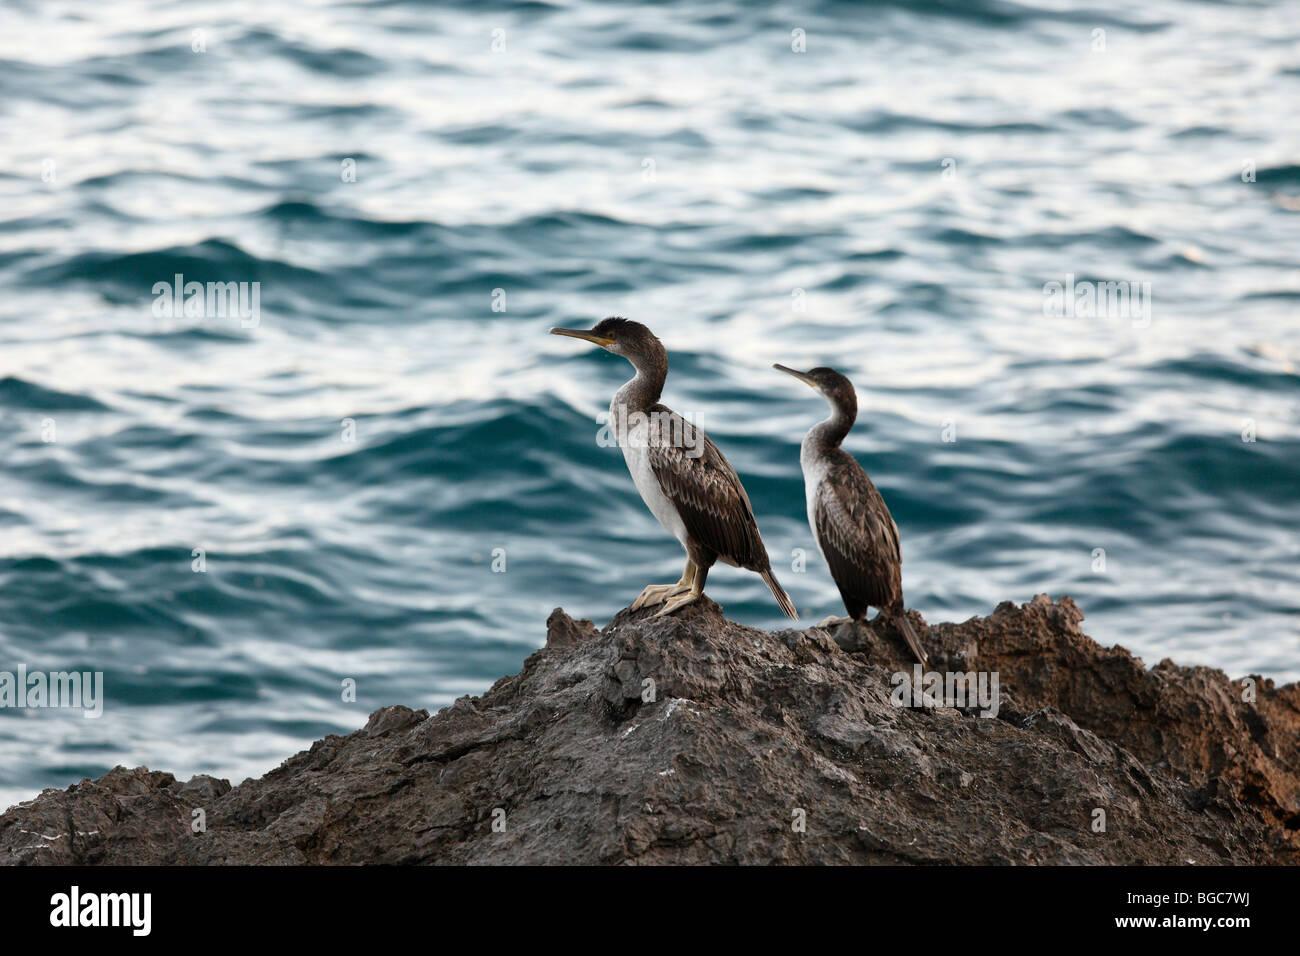 Great Cormorants (Phalacrocorax carbo) on a rock by the sea, Croatia, Europe - Stock Image